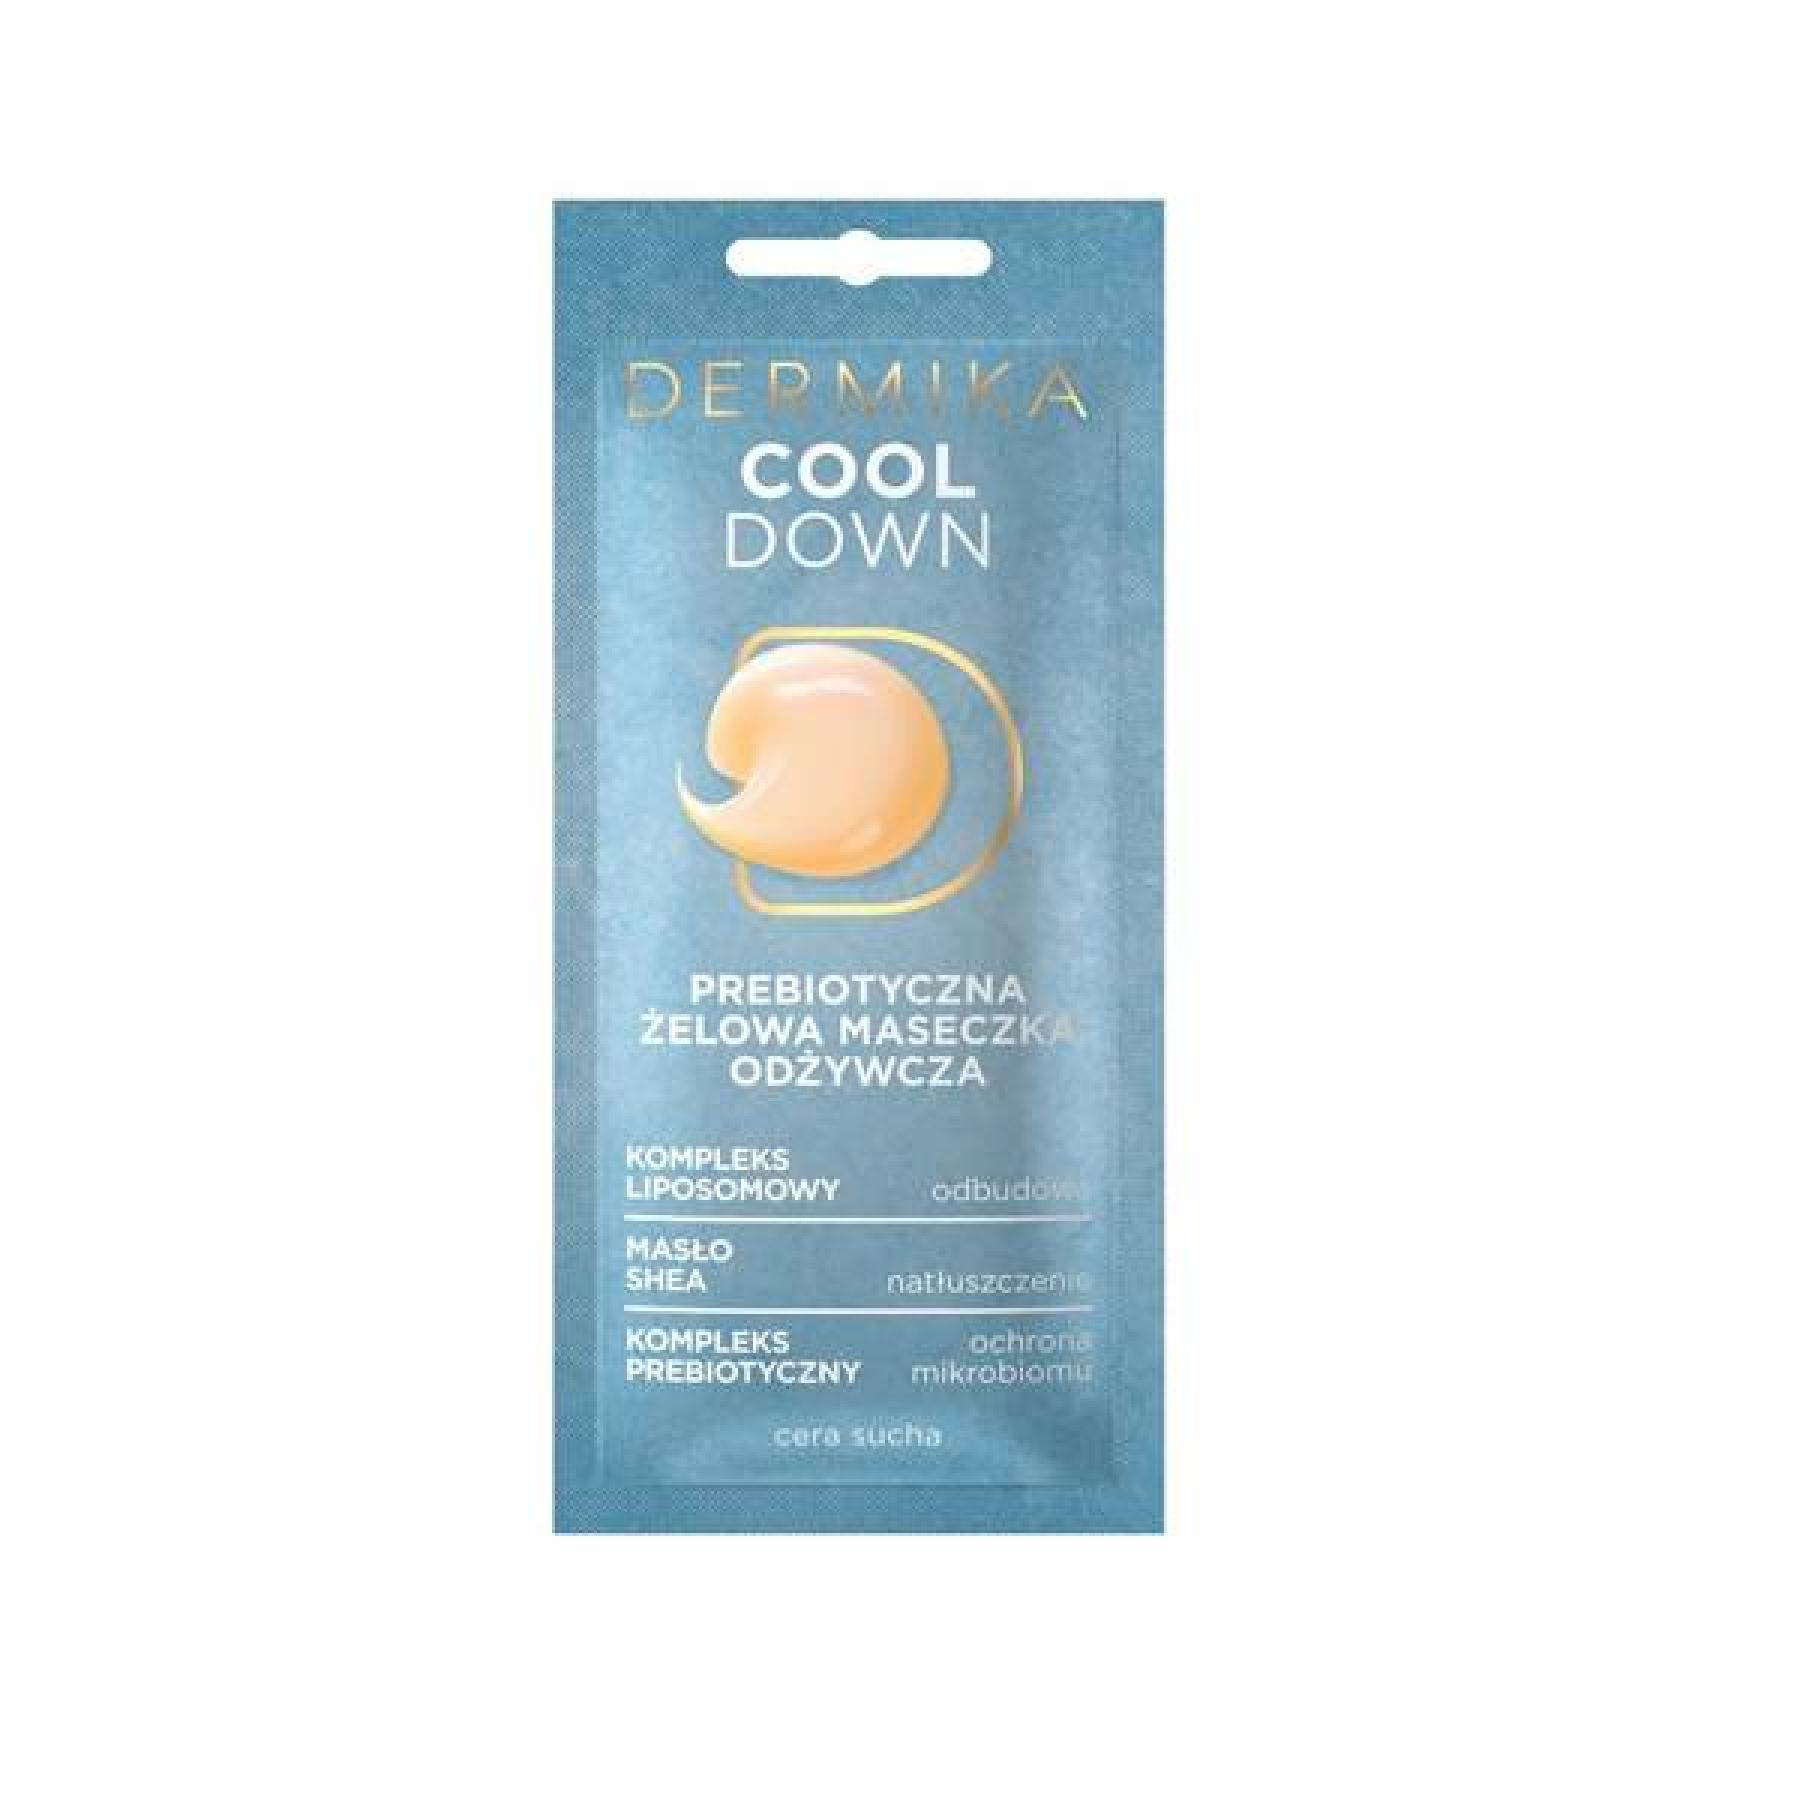 Cool down- Μασκα αντιγήρανσης 10ml